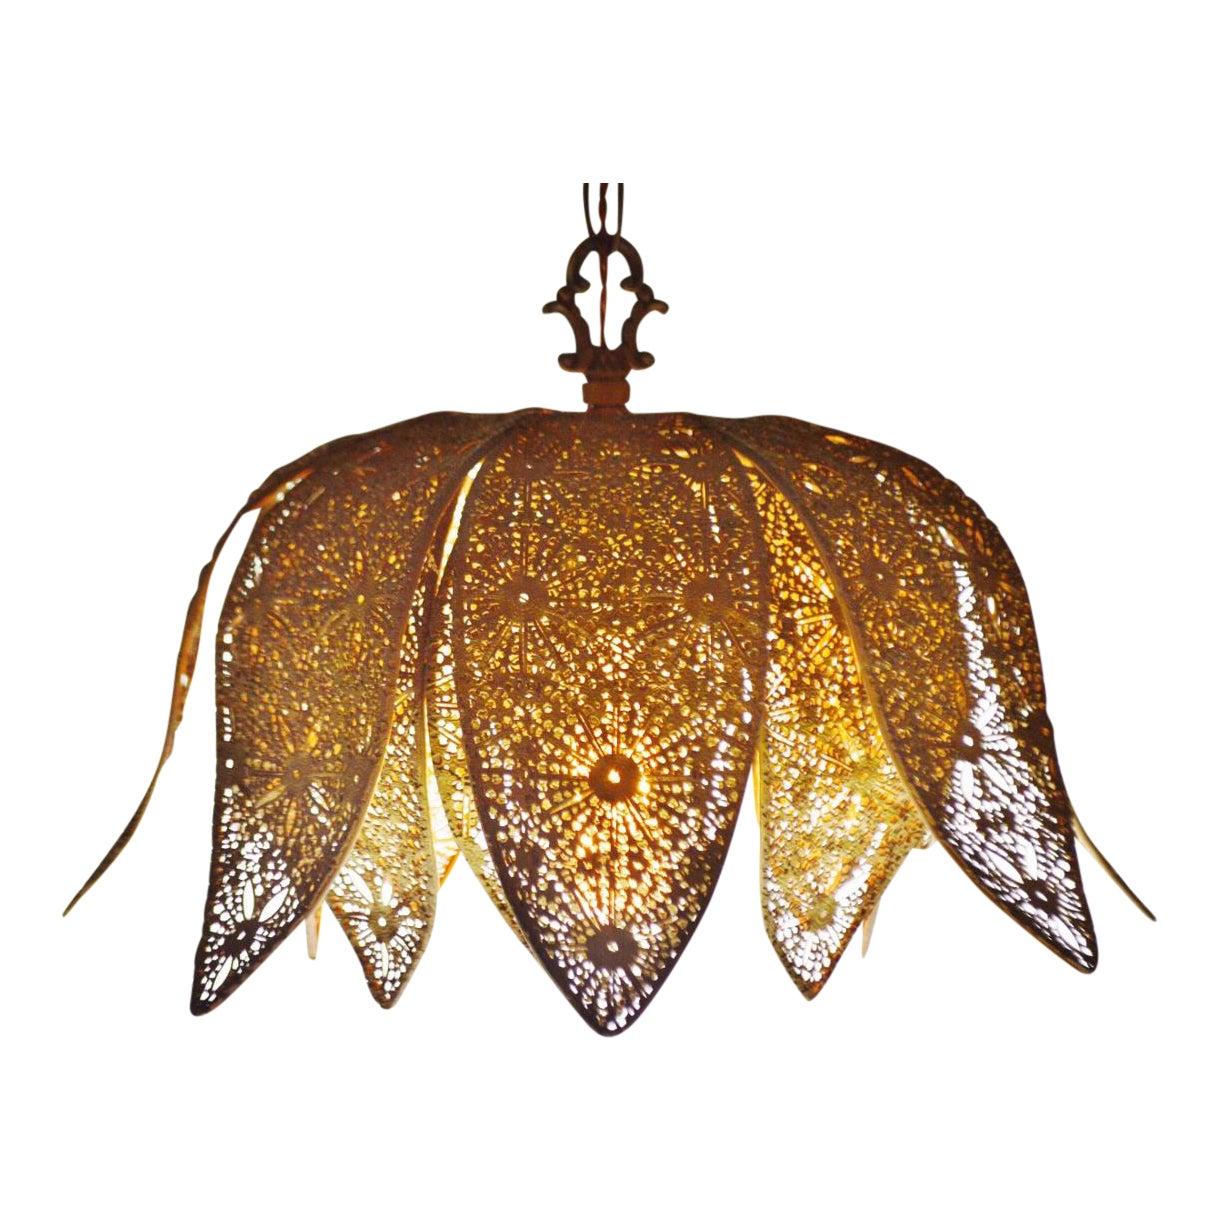 Vintage Moroccan Reticulated Metal Lotus Flower Pendant Light Chairish